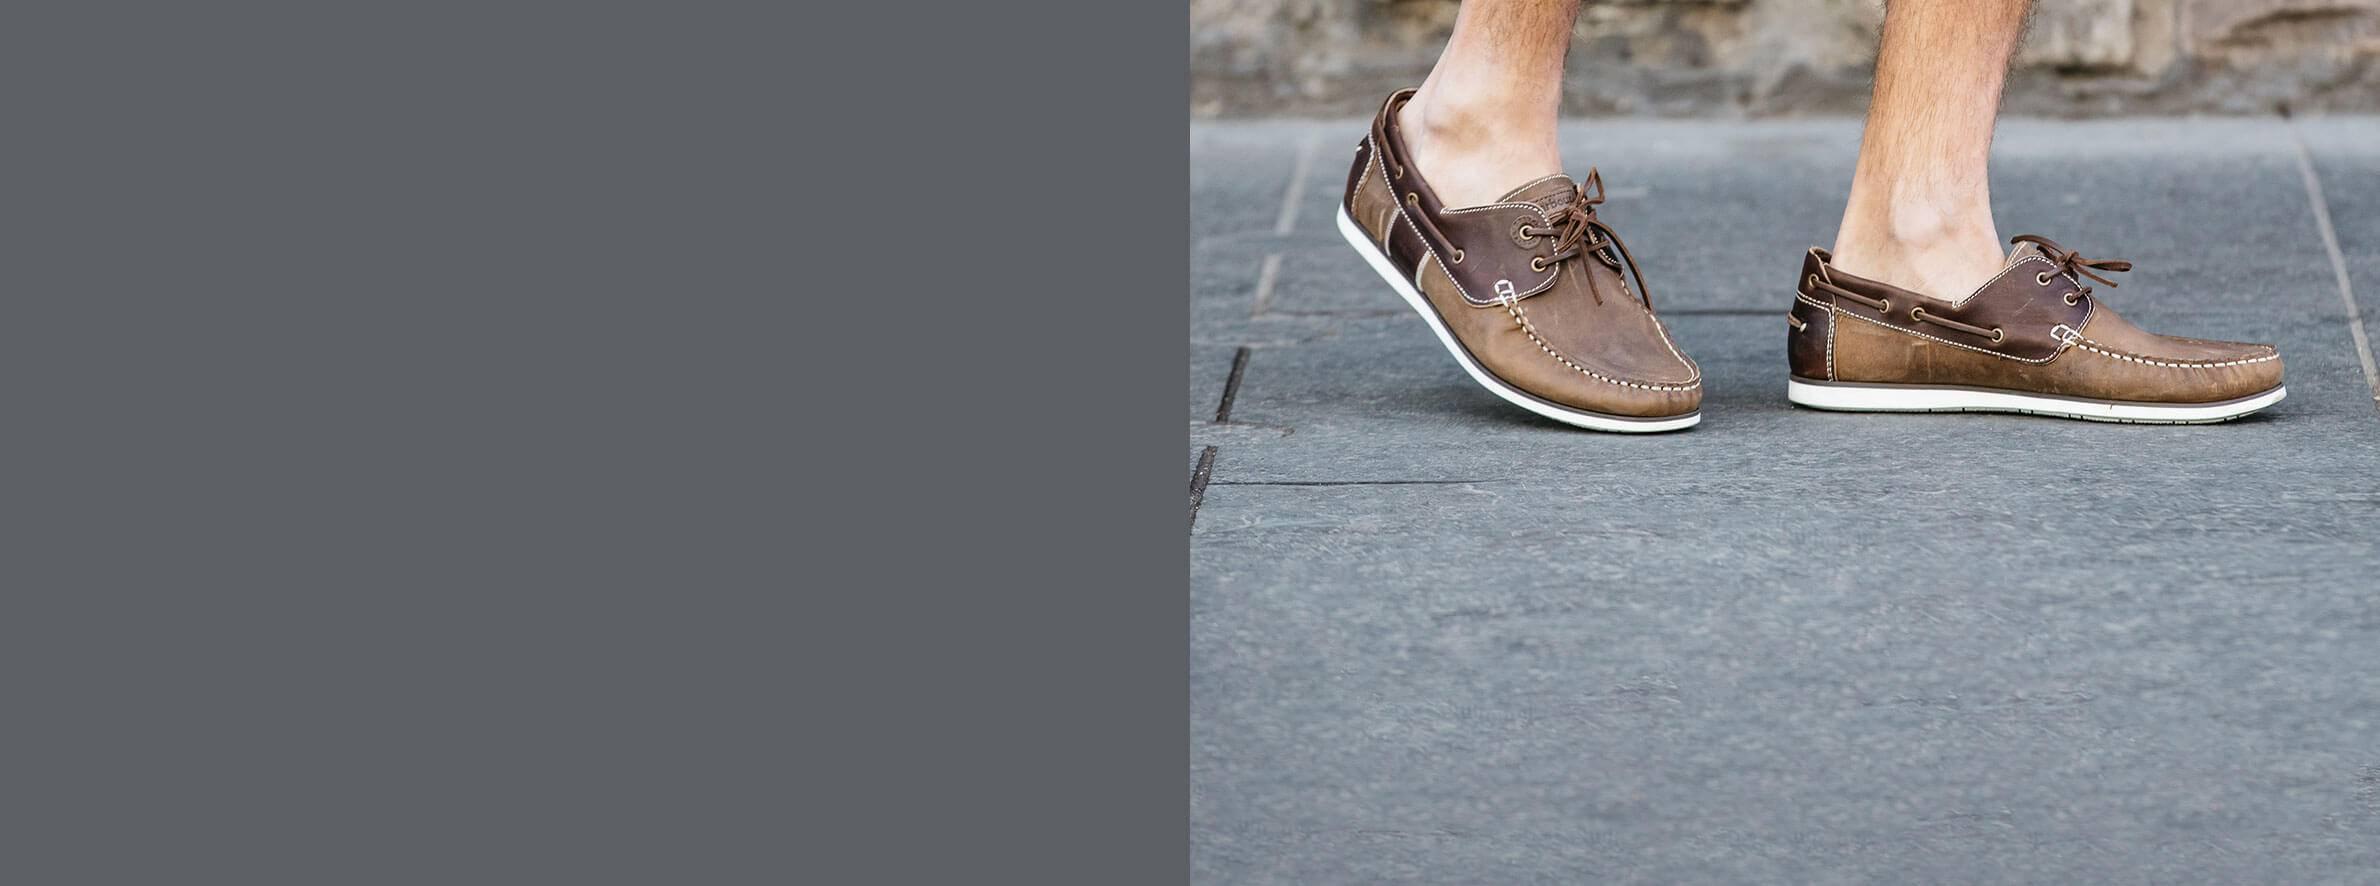 Barbour Shoes